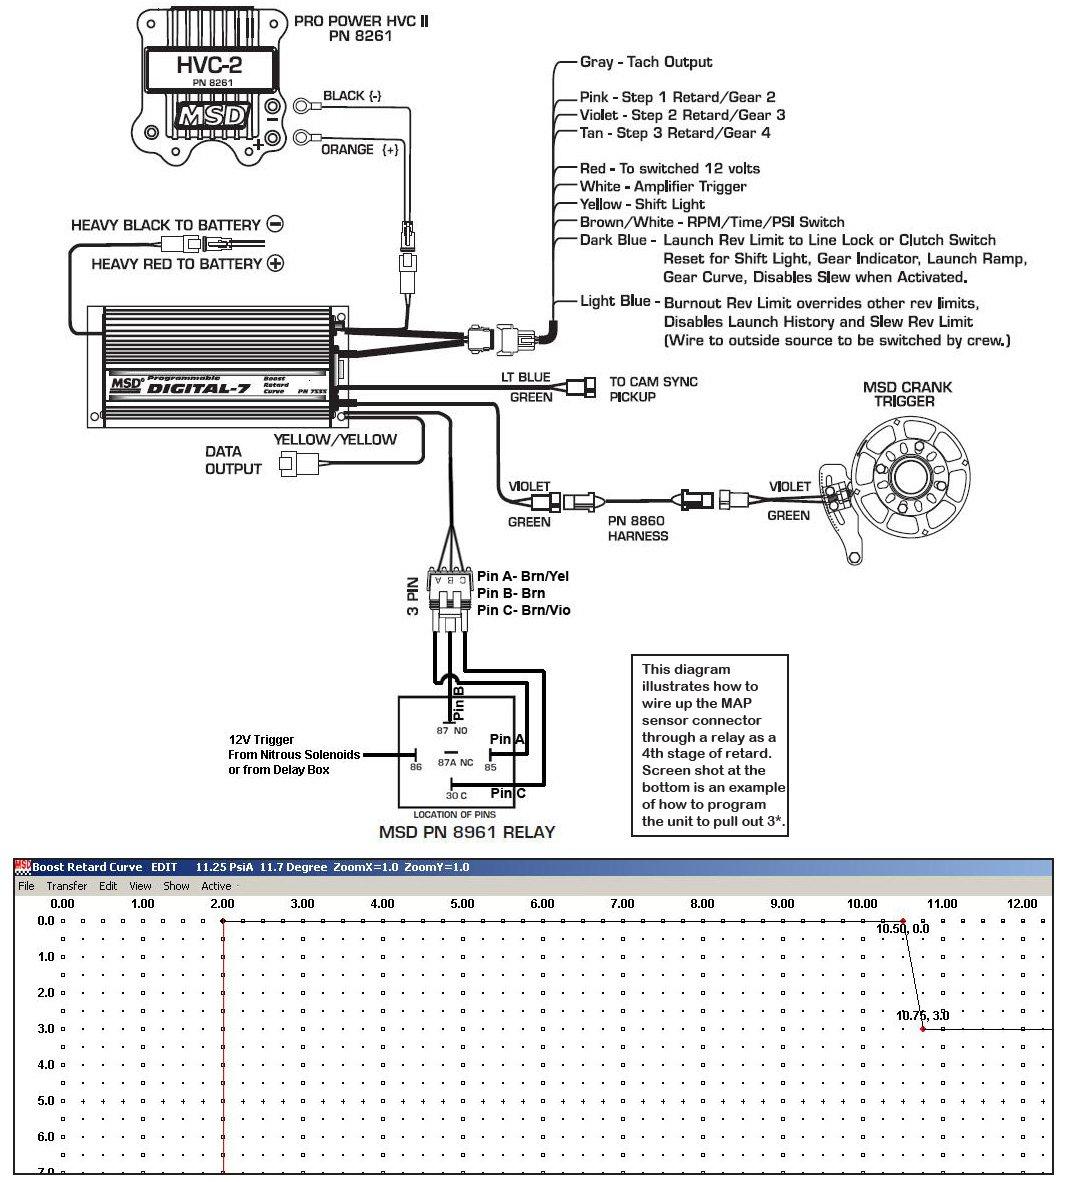 blog_diagrams_and_drawings_digital_7_drawings_7531_4th_stage_retard_map_4th_stage_retard_reva?resize\=665%2C738\&ssl\=1 msd 7al 2 wiring diagram chevy ignition msd 7al2 for sale \u2022 45 63 msd 7al-2 wiring diagram 7220 at soozxer.org